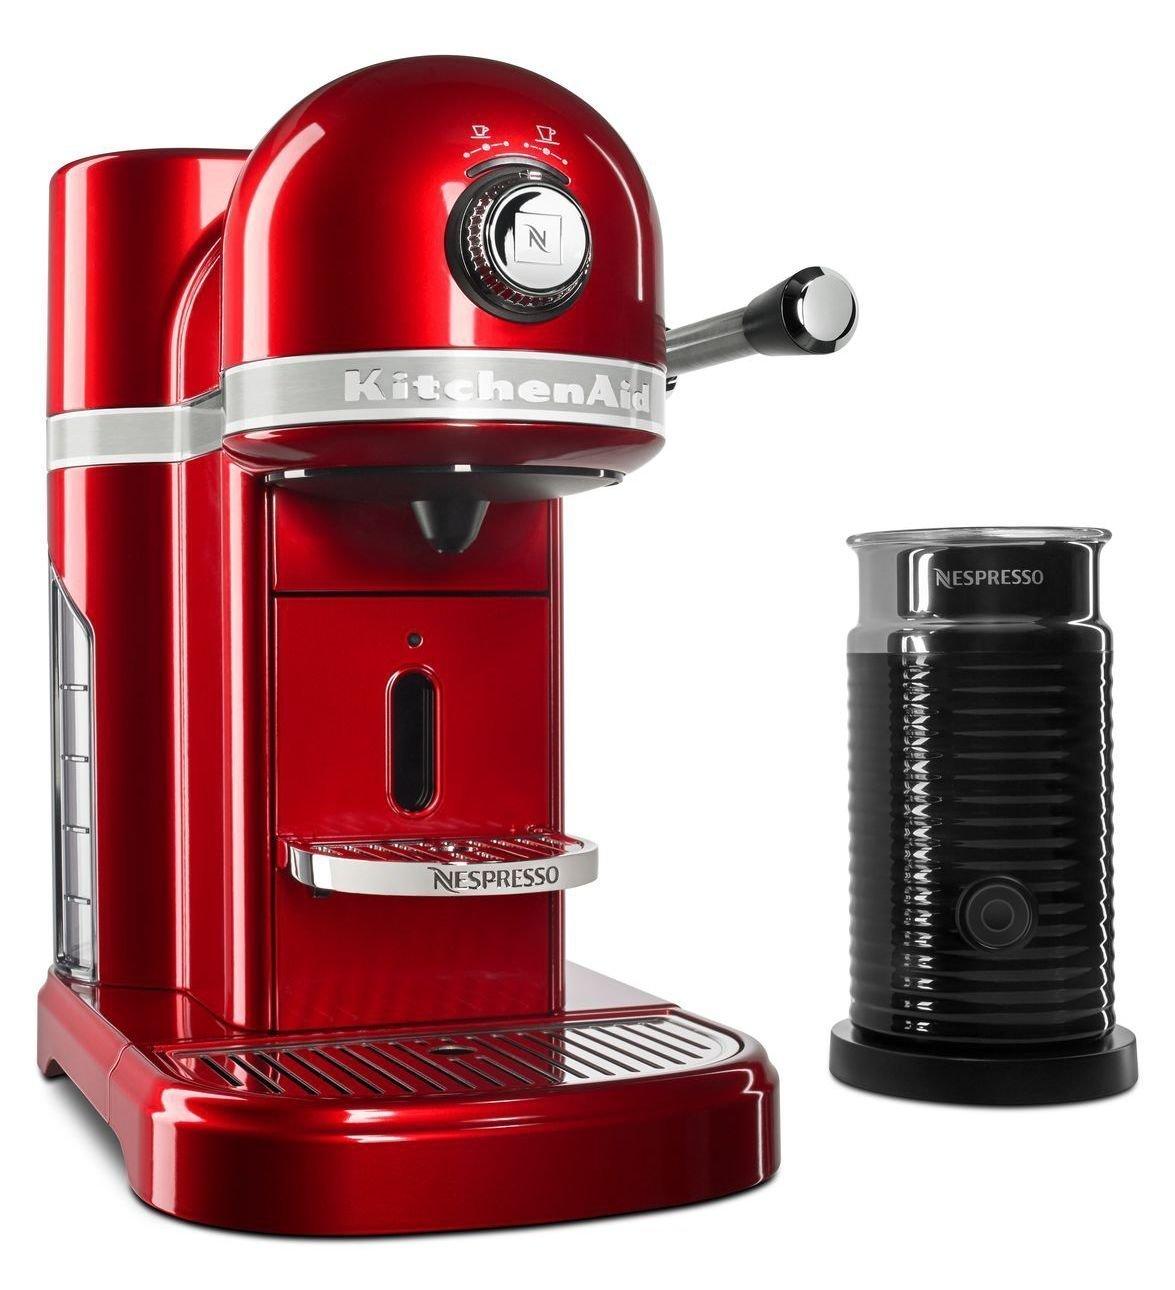 KitchenAid KES0504CA Candy Apple Red Aeroccino Milk Frother Nespresso Espresso Maker, 1.3 L, by KitchenAid